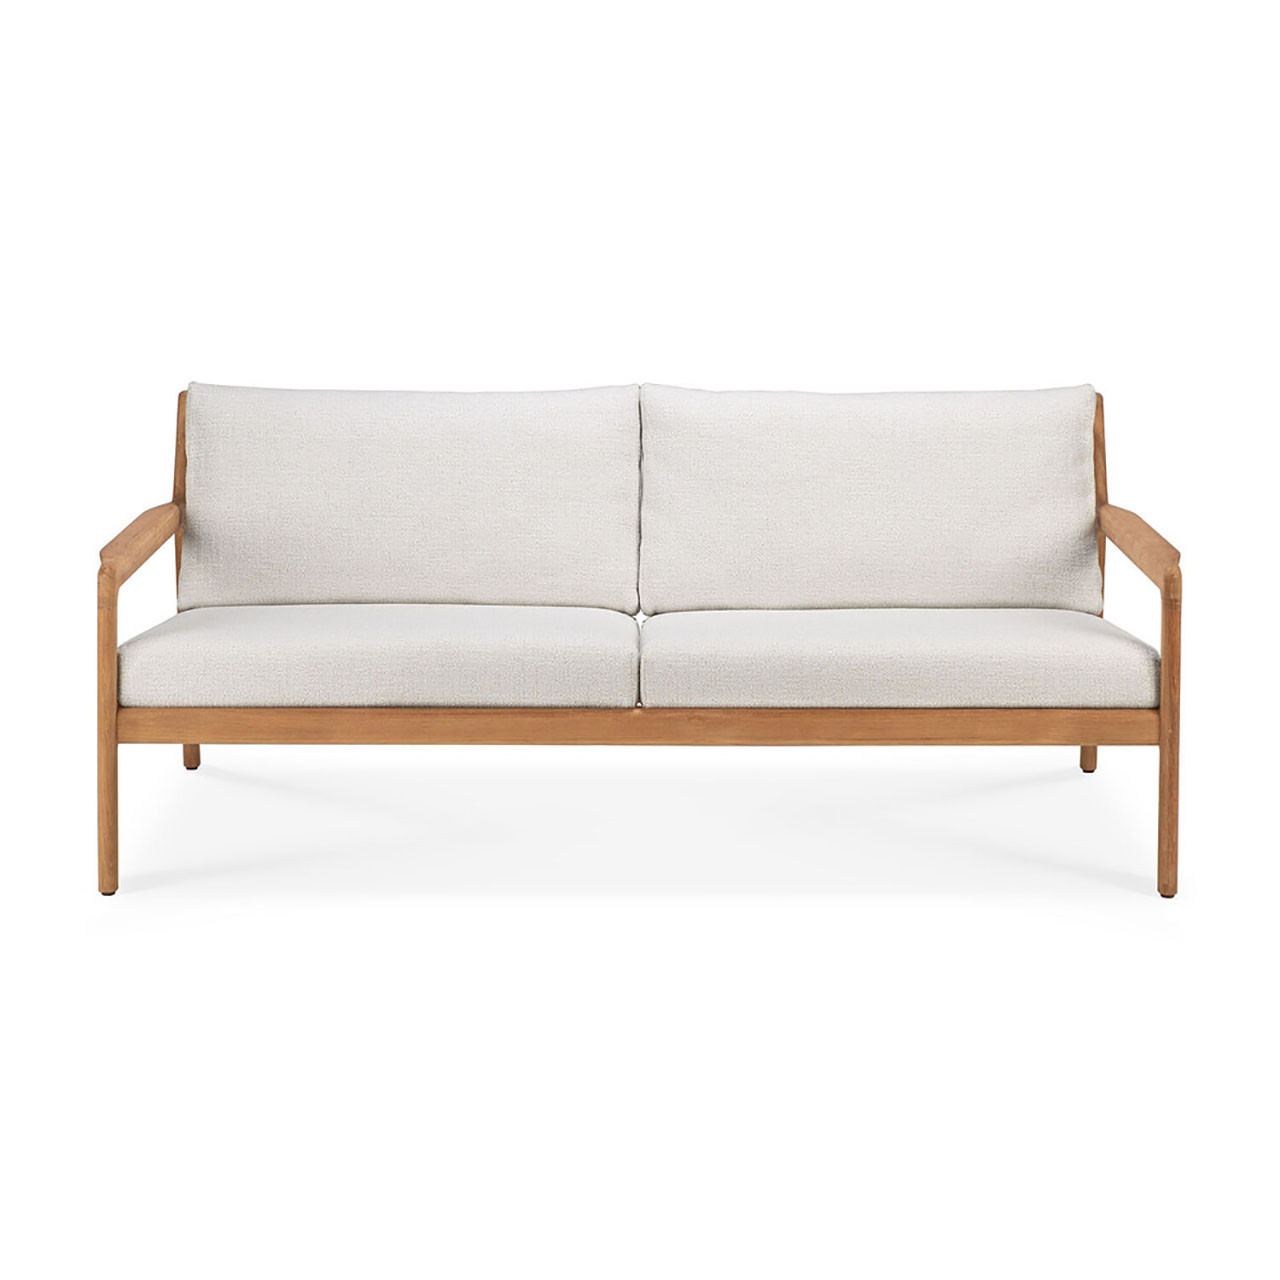 Teak Jack Outdoor 2 Seater Sofa